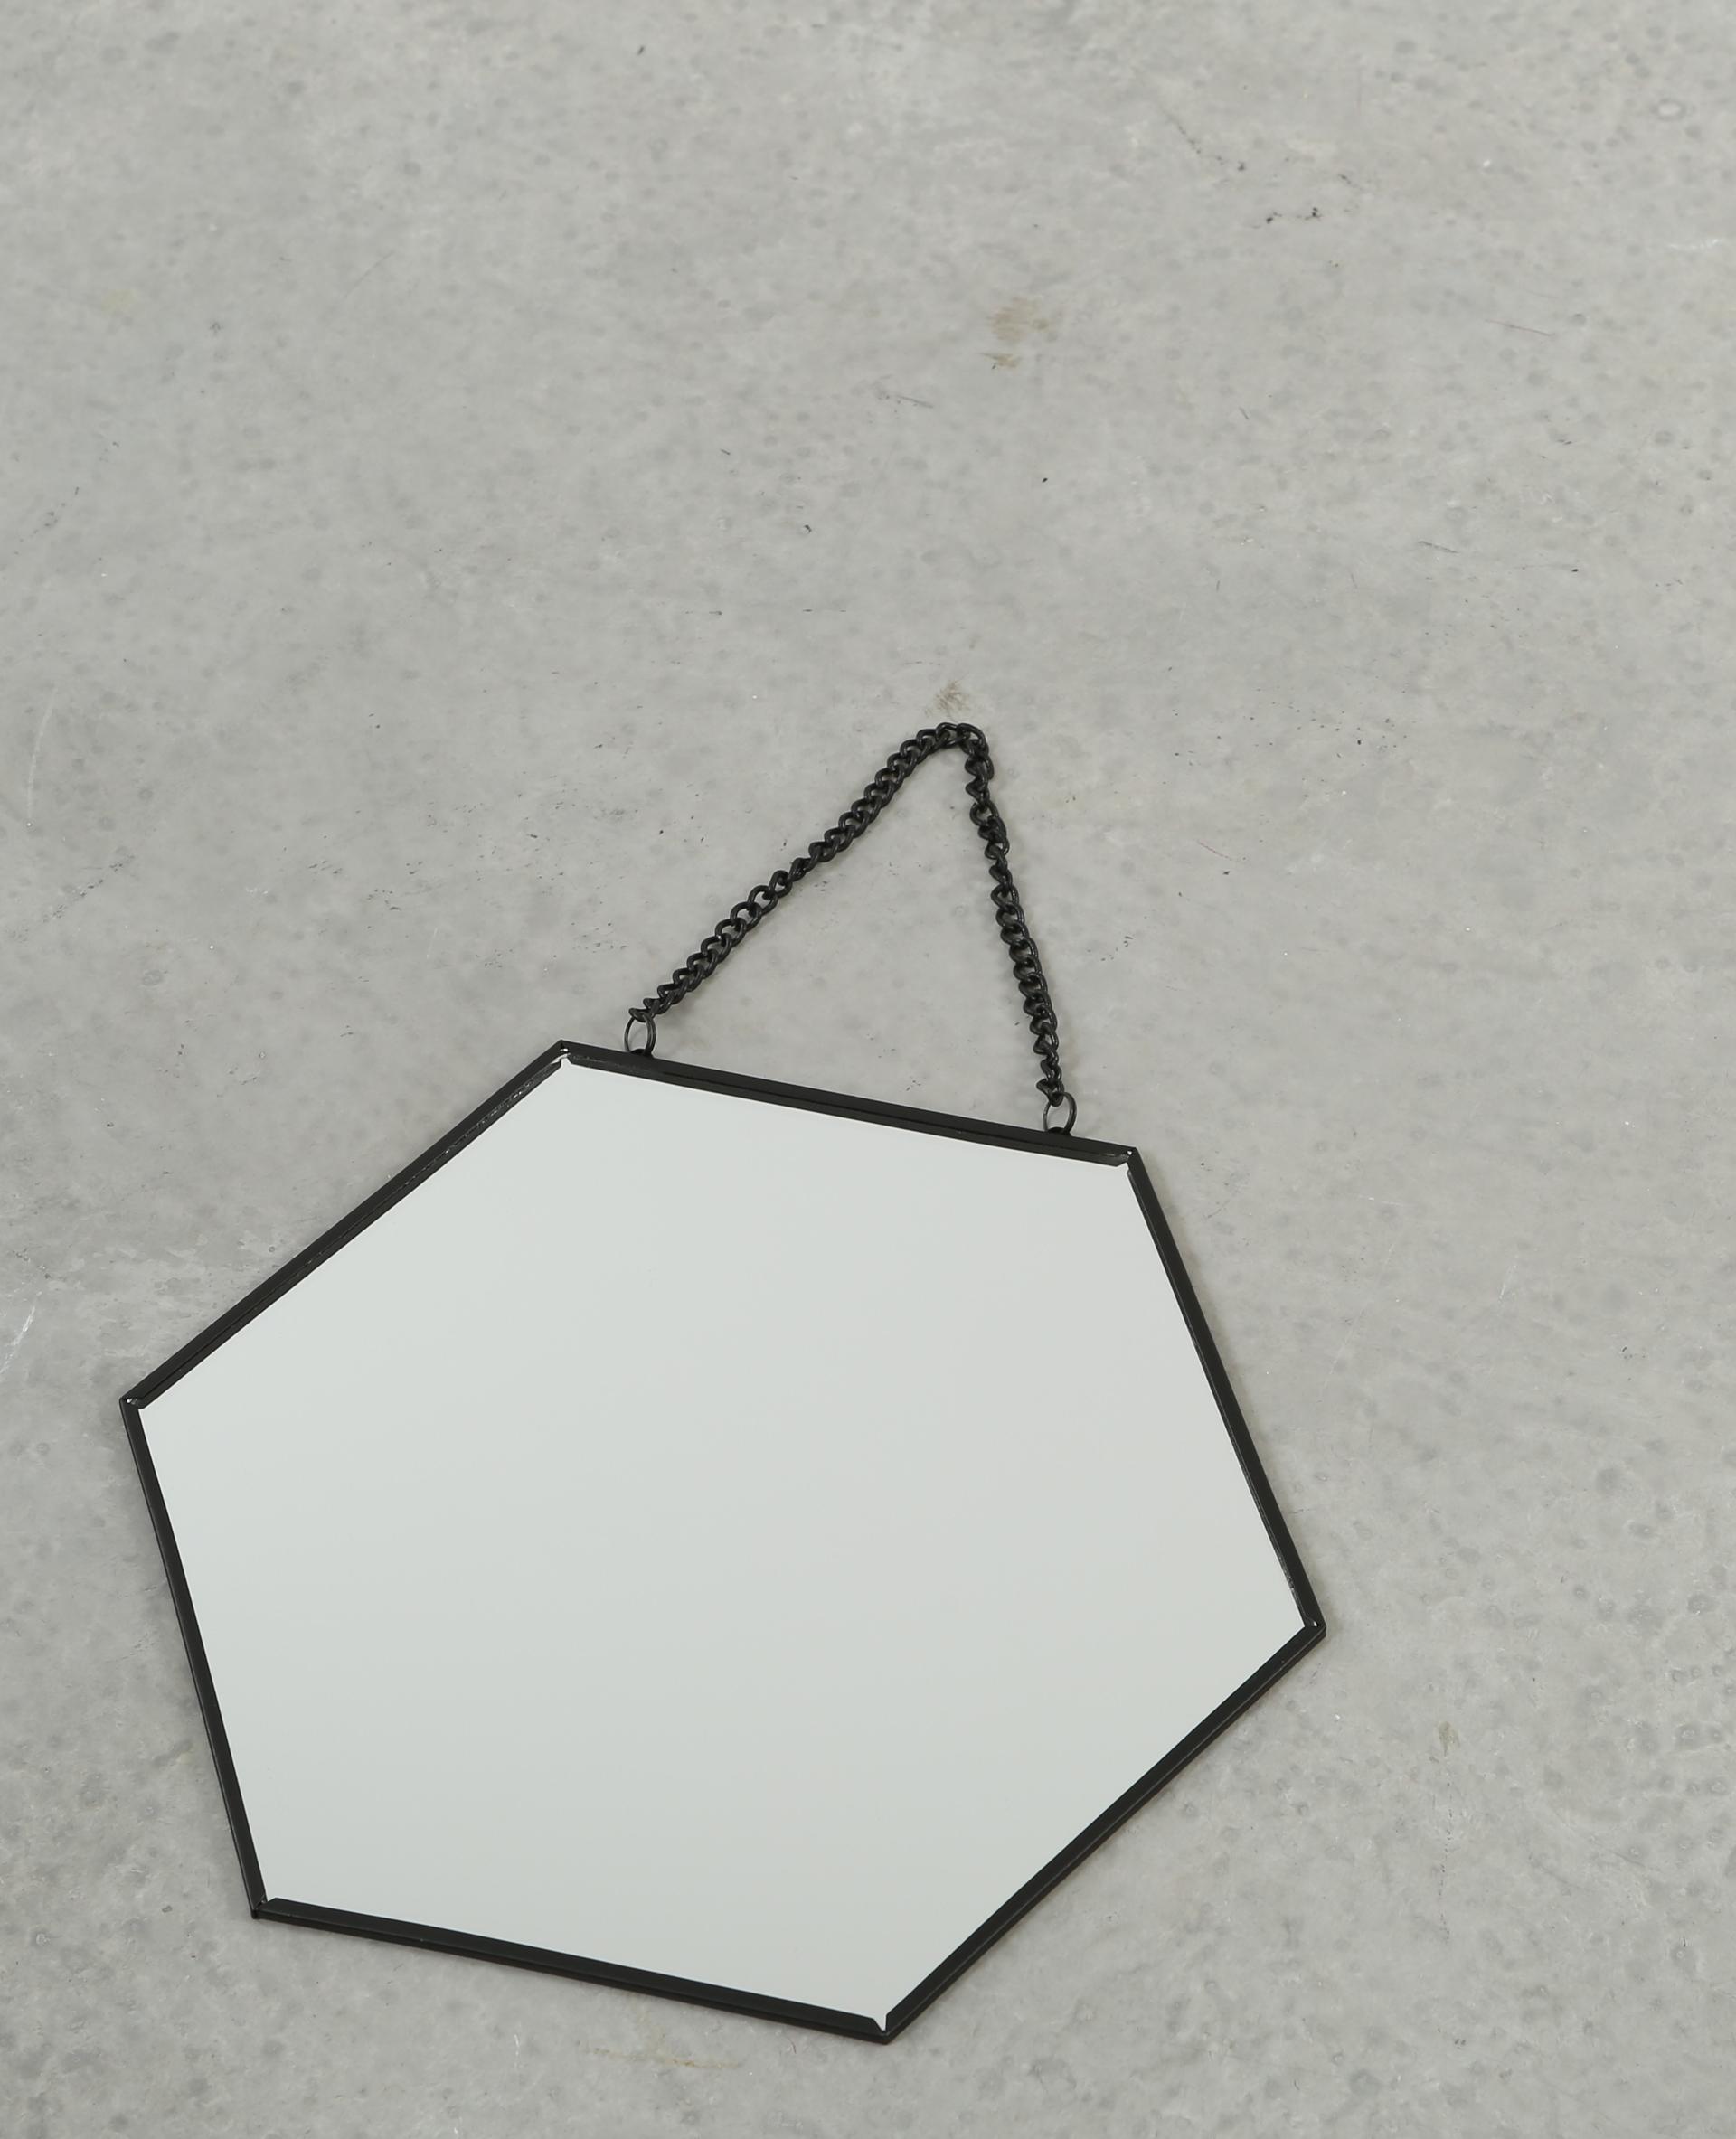 Petit miroir hexagonal noir 975083899a4g pimkie for Petit miroir noir